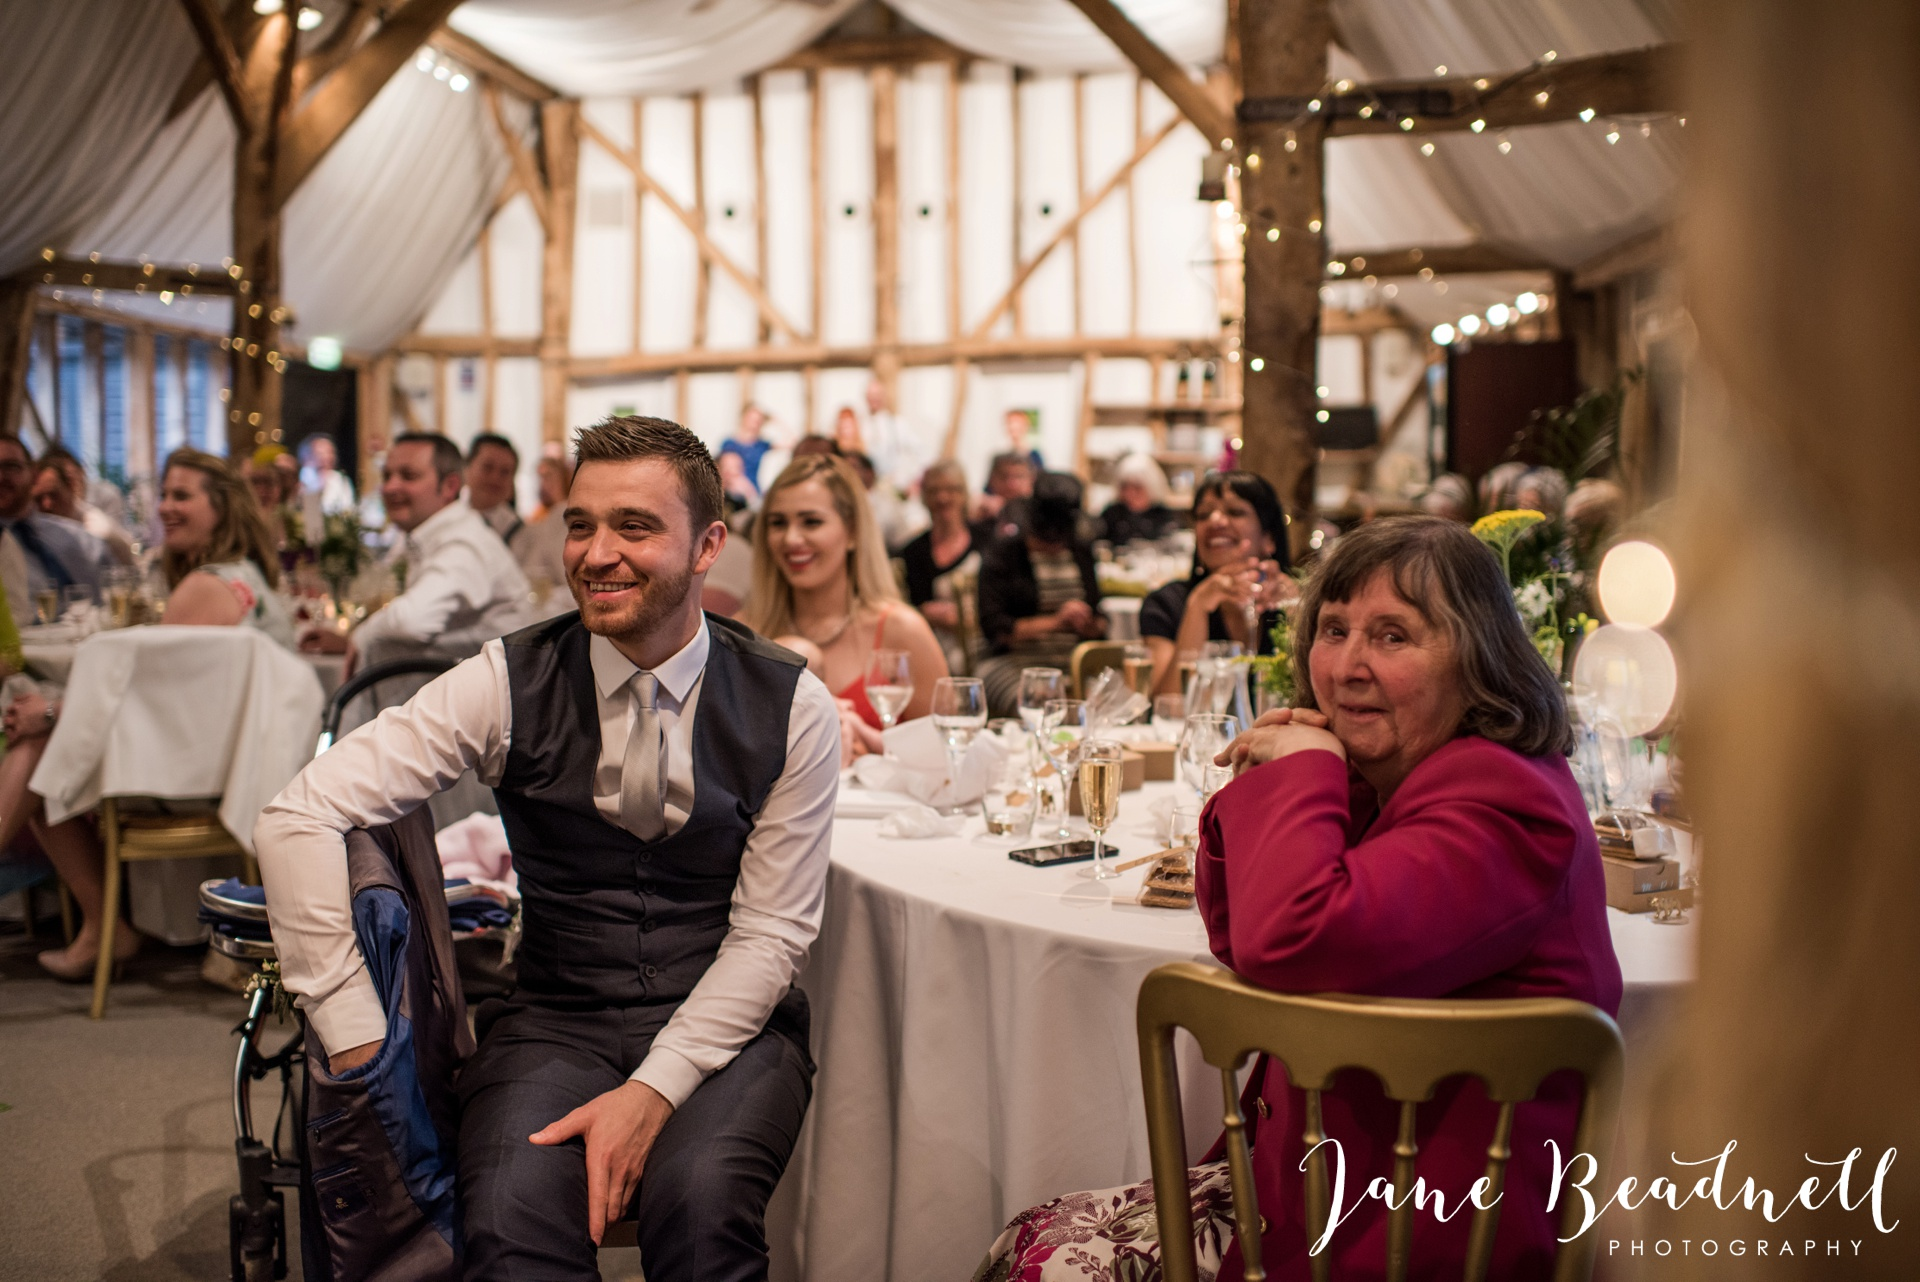 South Farm Wedding photography Hertfordshire by Jane Beadnell Photography fine art wedding photographer_0200